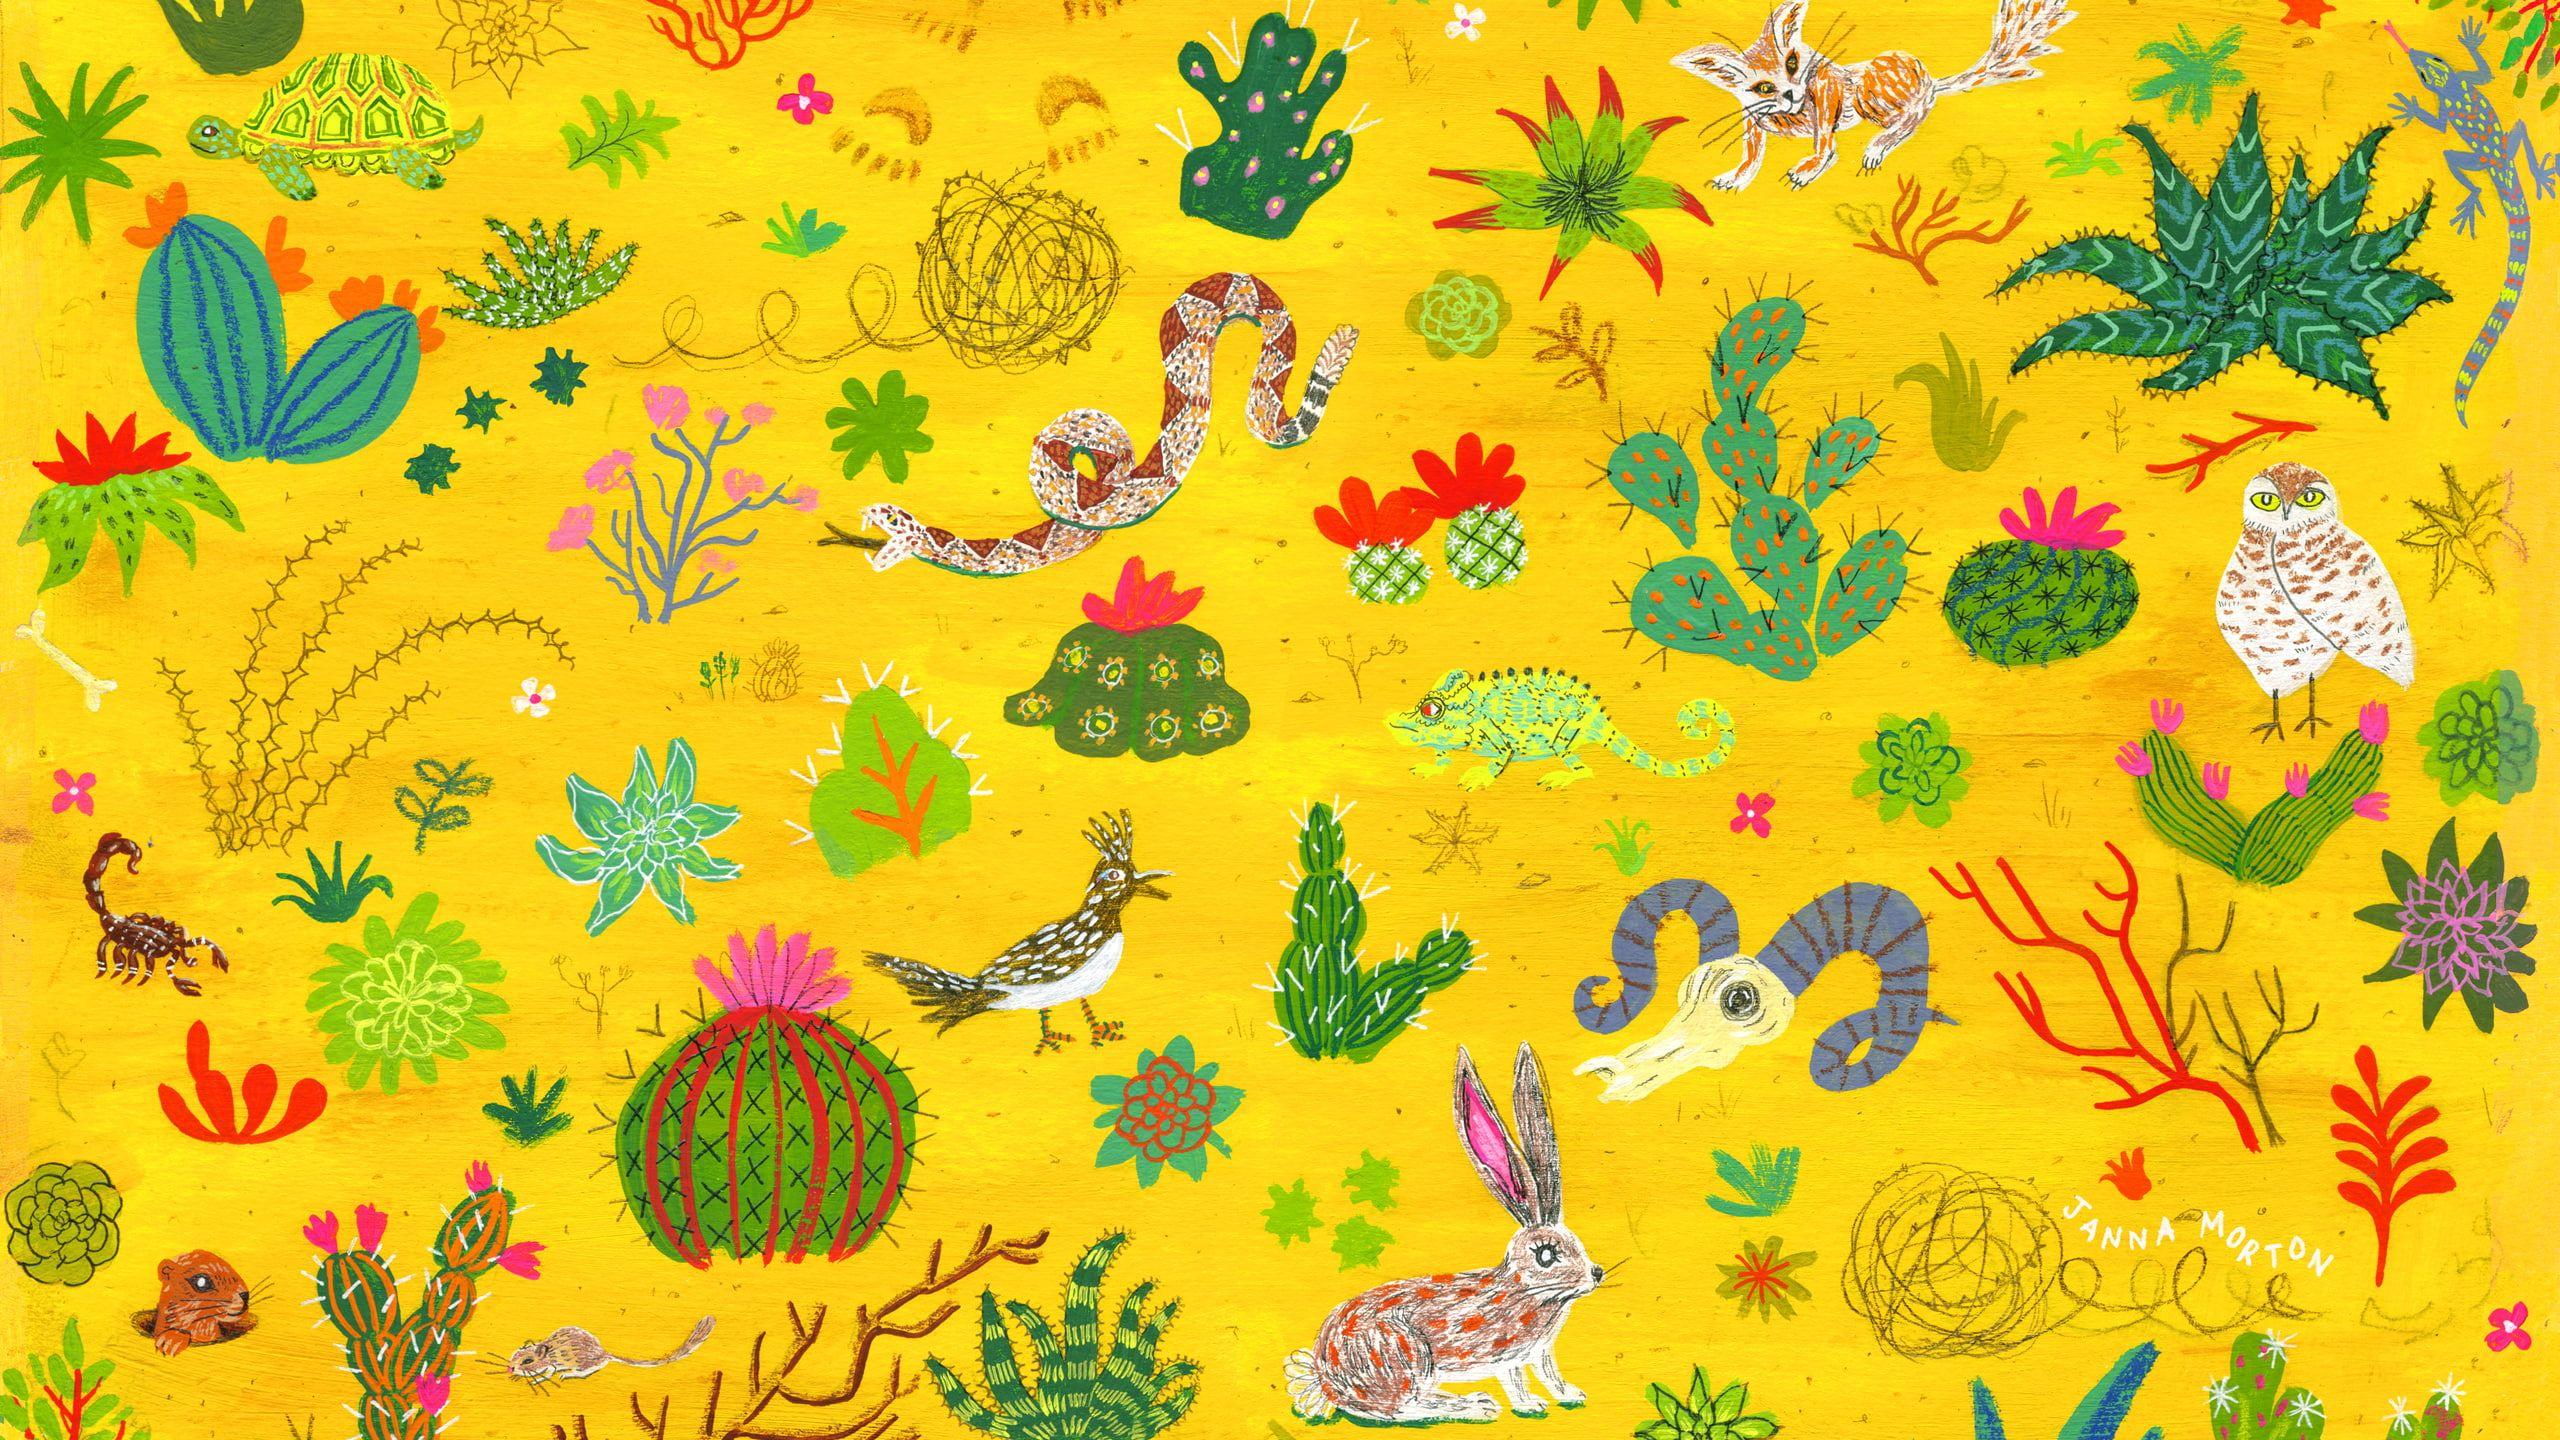 Cactus Snake 2k Wallpaper Hdwallpaper Desktop Aesthetic Wallpapers Wallpaper Project Computer Wallpaper